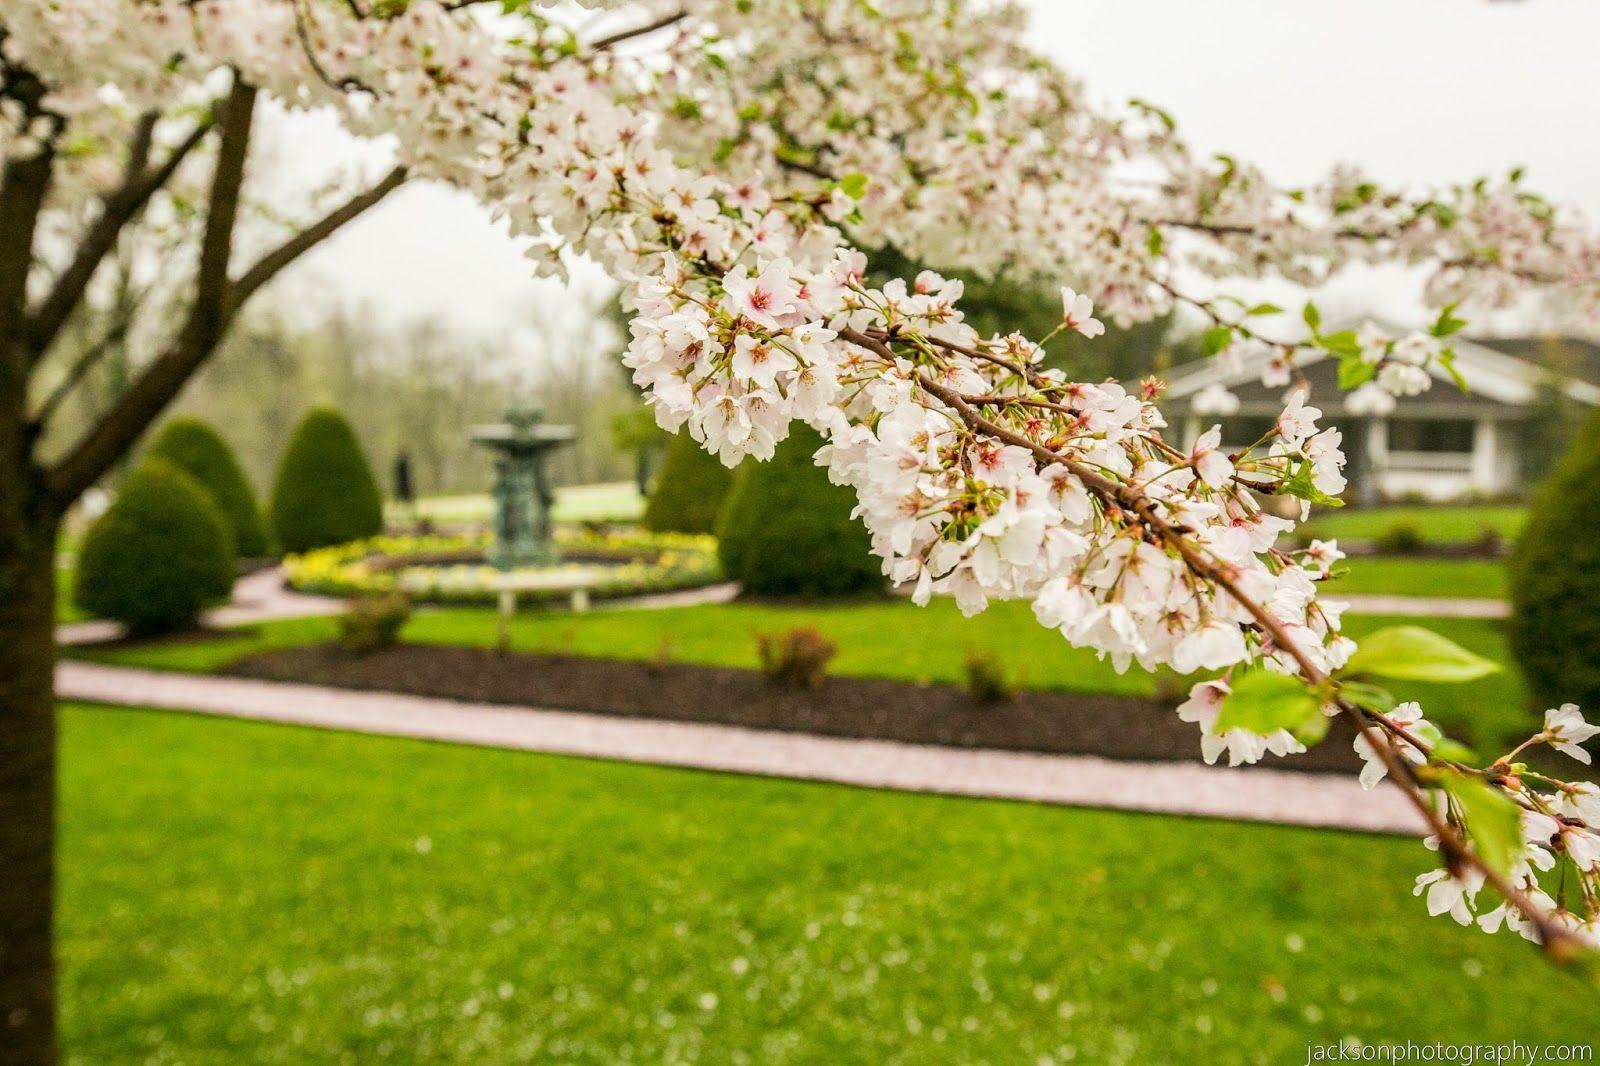 Antrim 1844 Country House Hotel: Intimate Spring Wedding - Liu & Ren